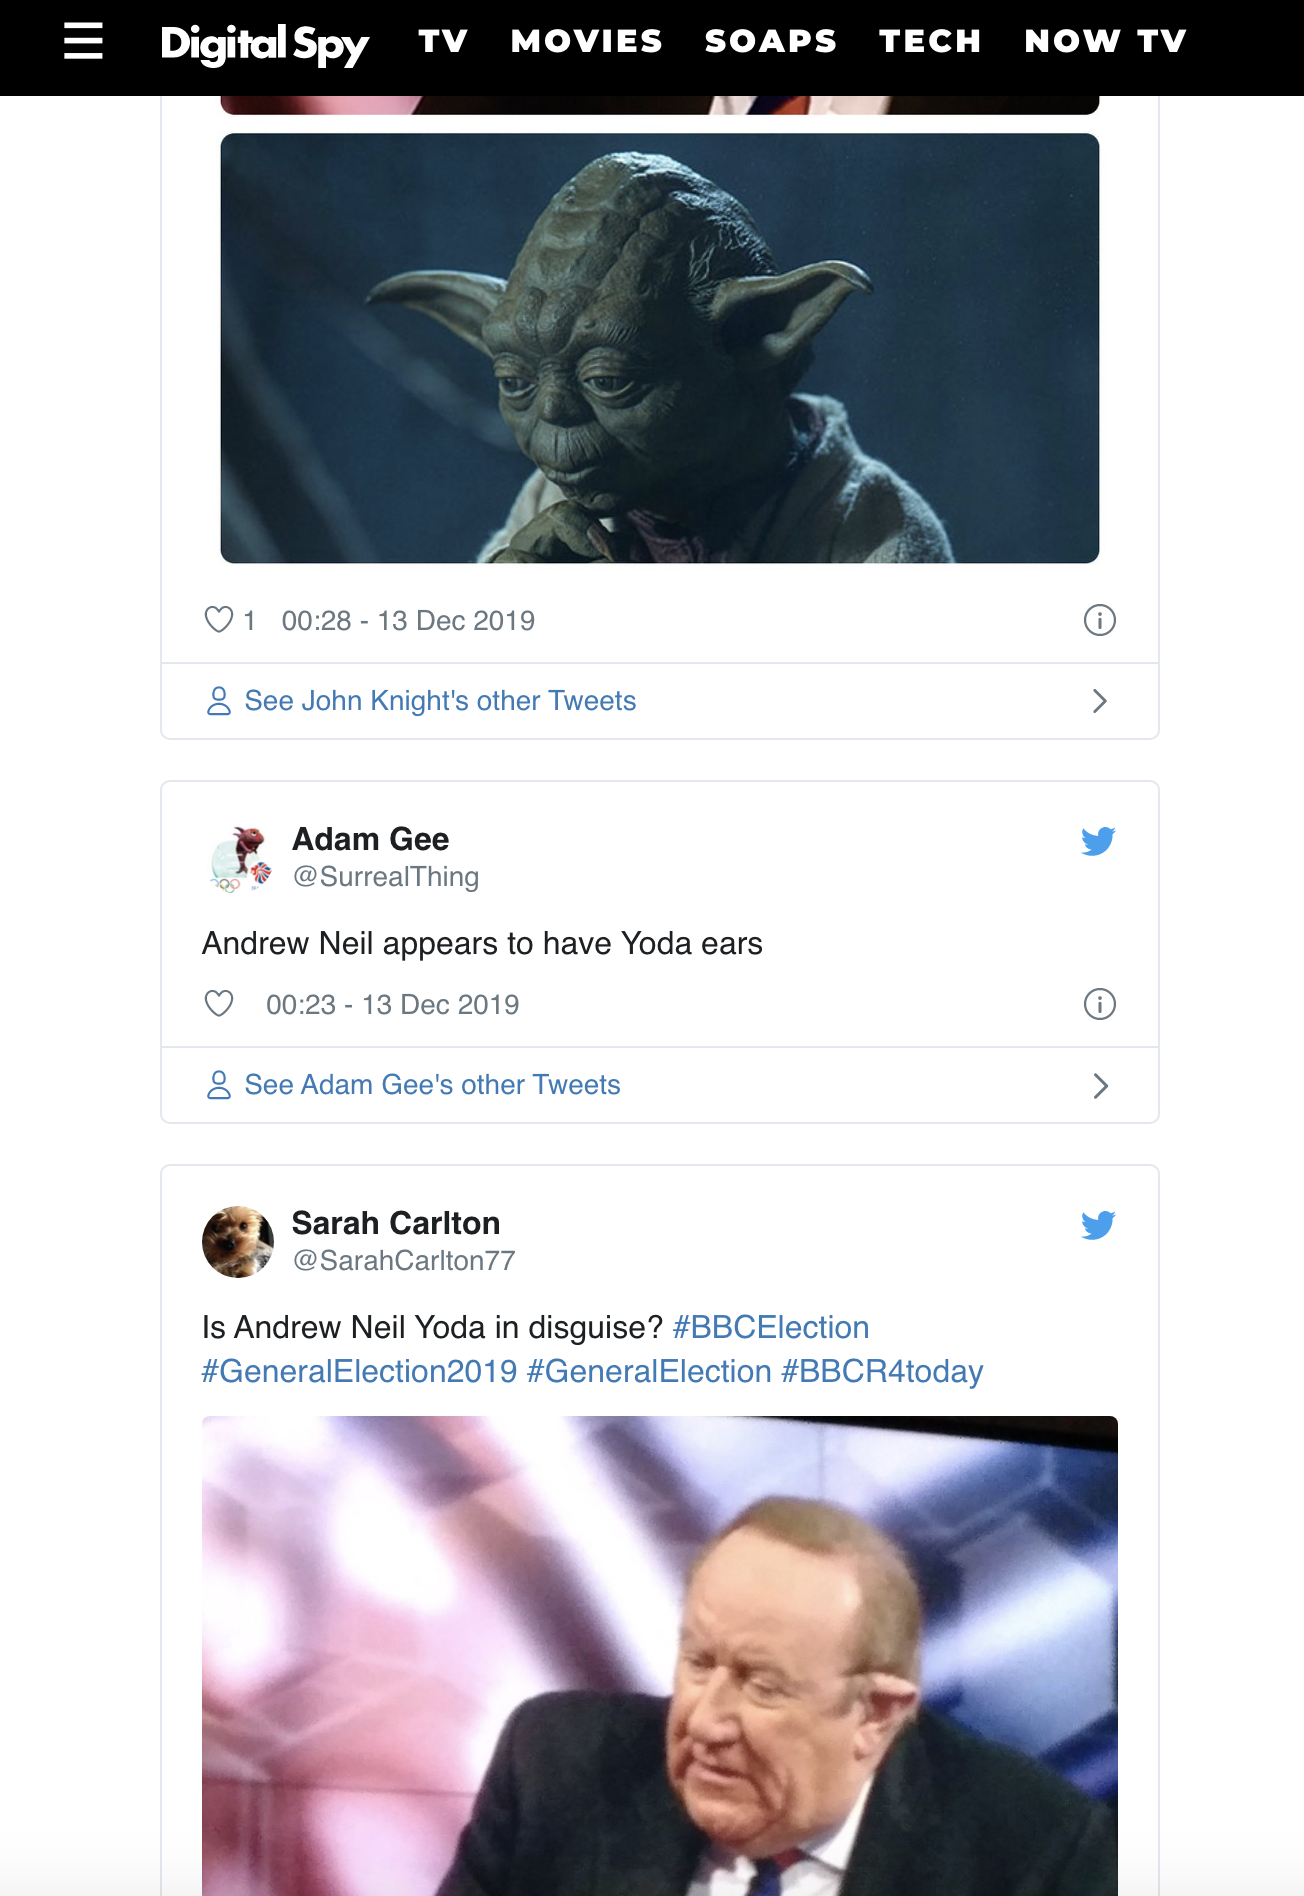 Digital Spy 2019-12-13 yoda star wars